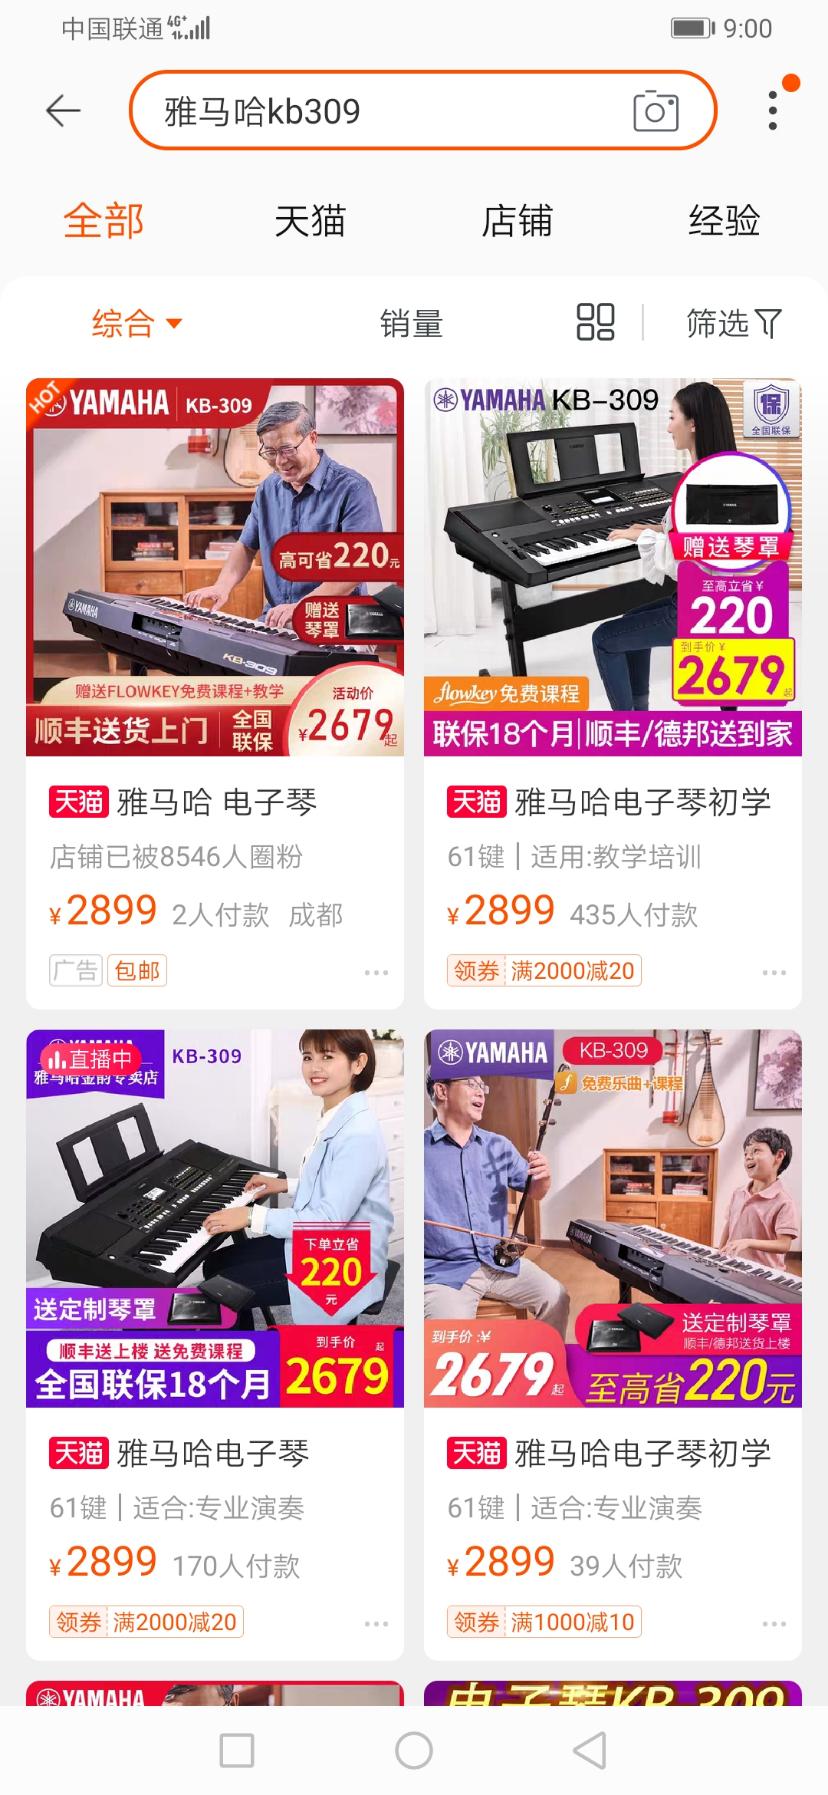 Screenshot_20200916_090022_com.taobao.taobao.jpg